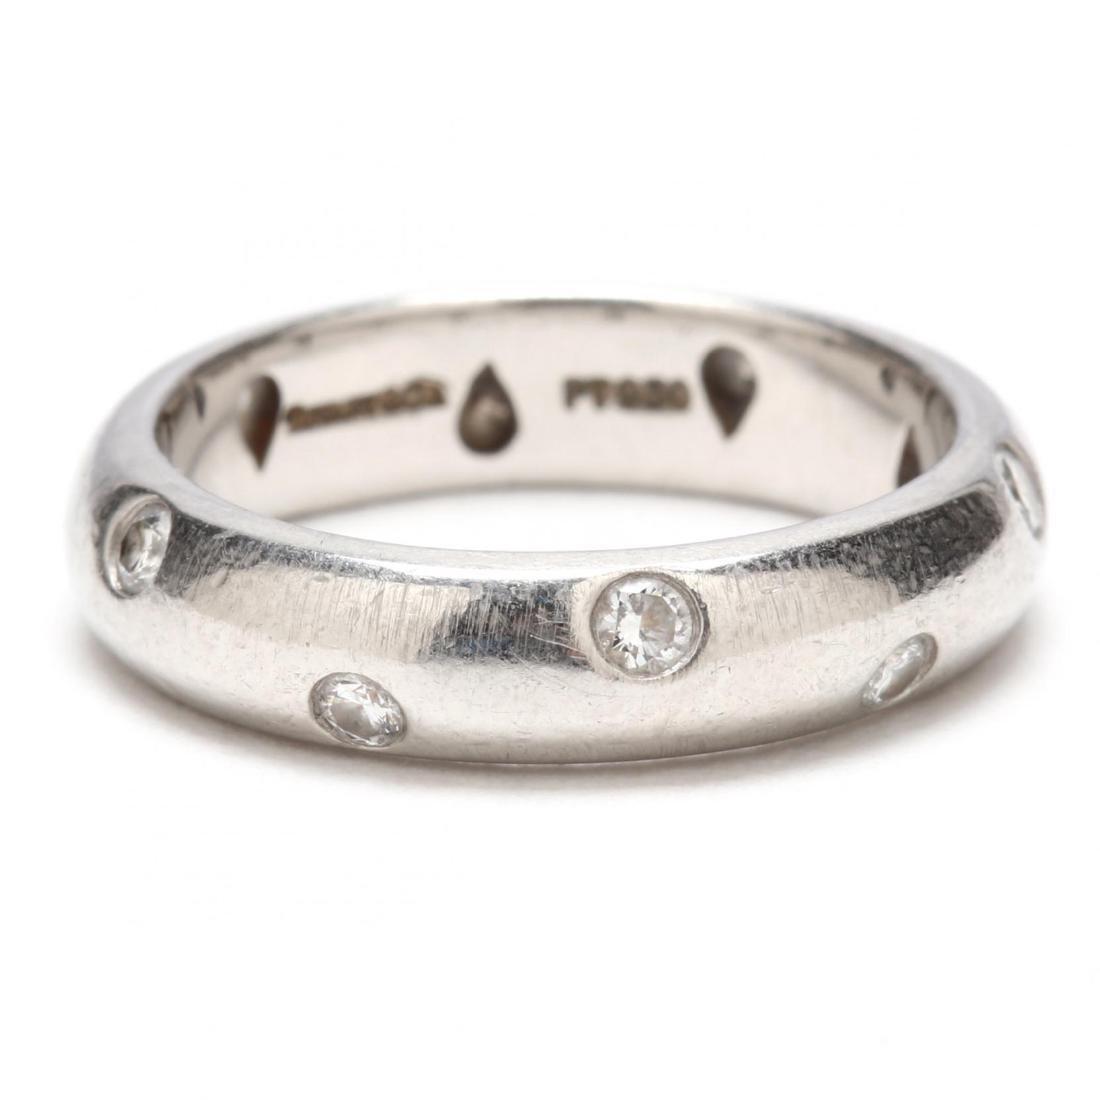 Platinum and Diamond Etoile Ring, Tiffany & Co. - 2